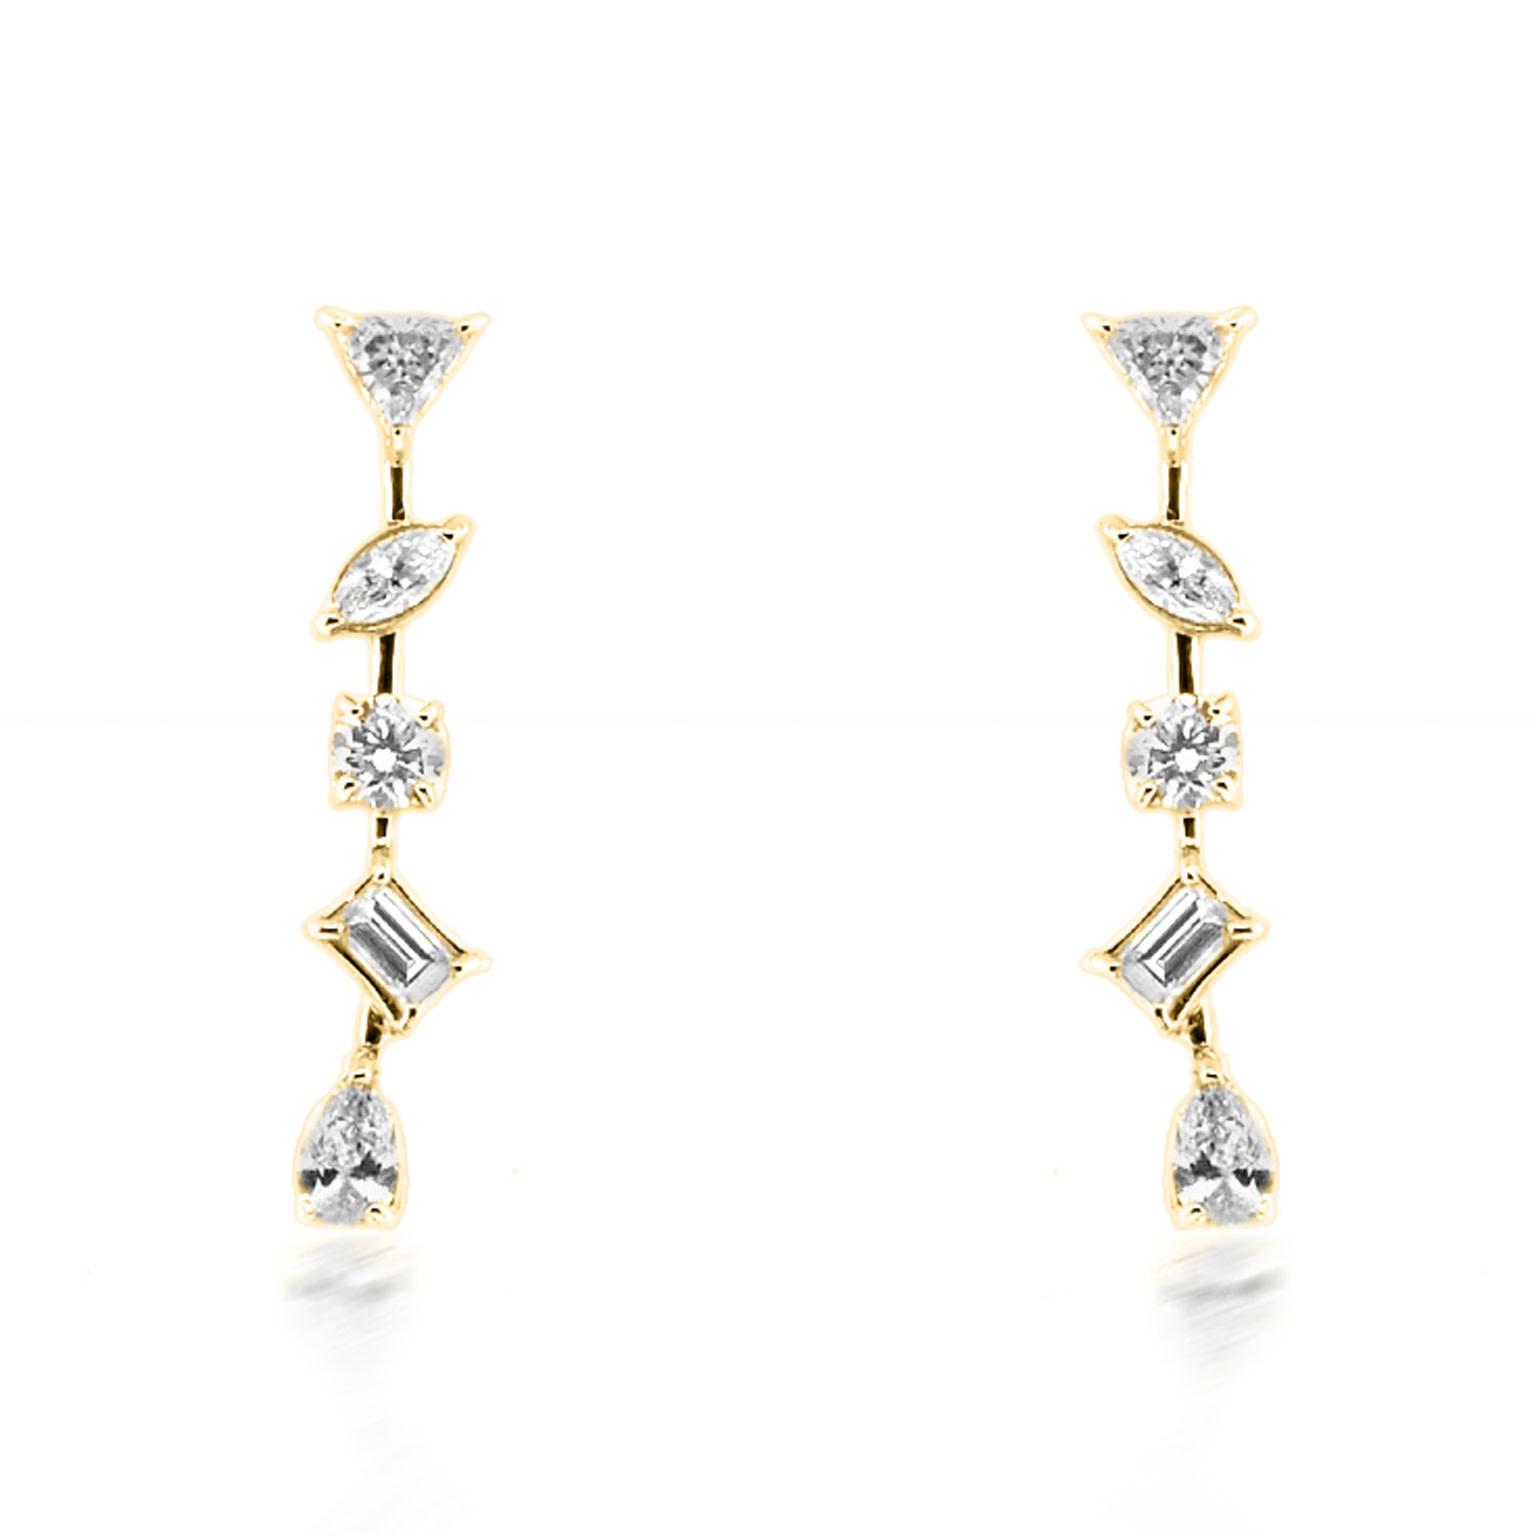 Trabert Goldsmiths Mixed Diamond Drop Earrings